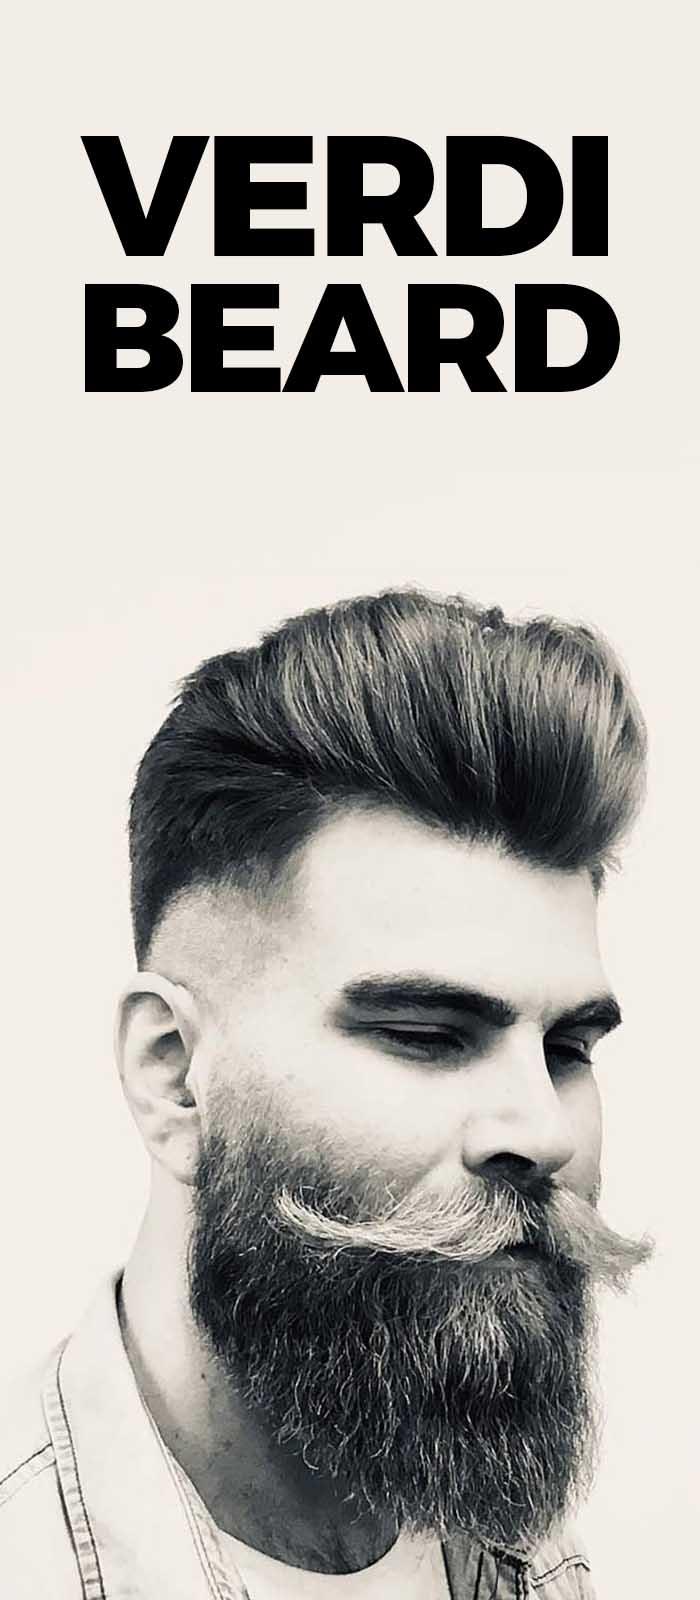 Ultra-Masculine & Sexy Verdi Beard In Just 5 Steps!